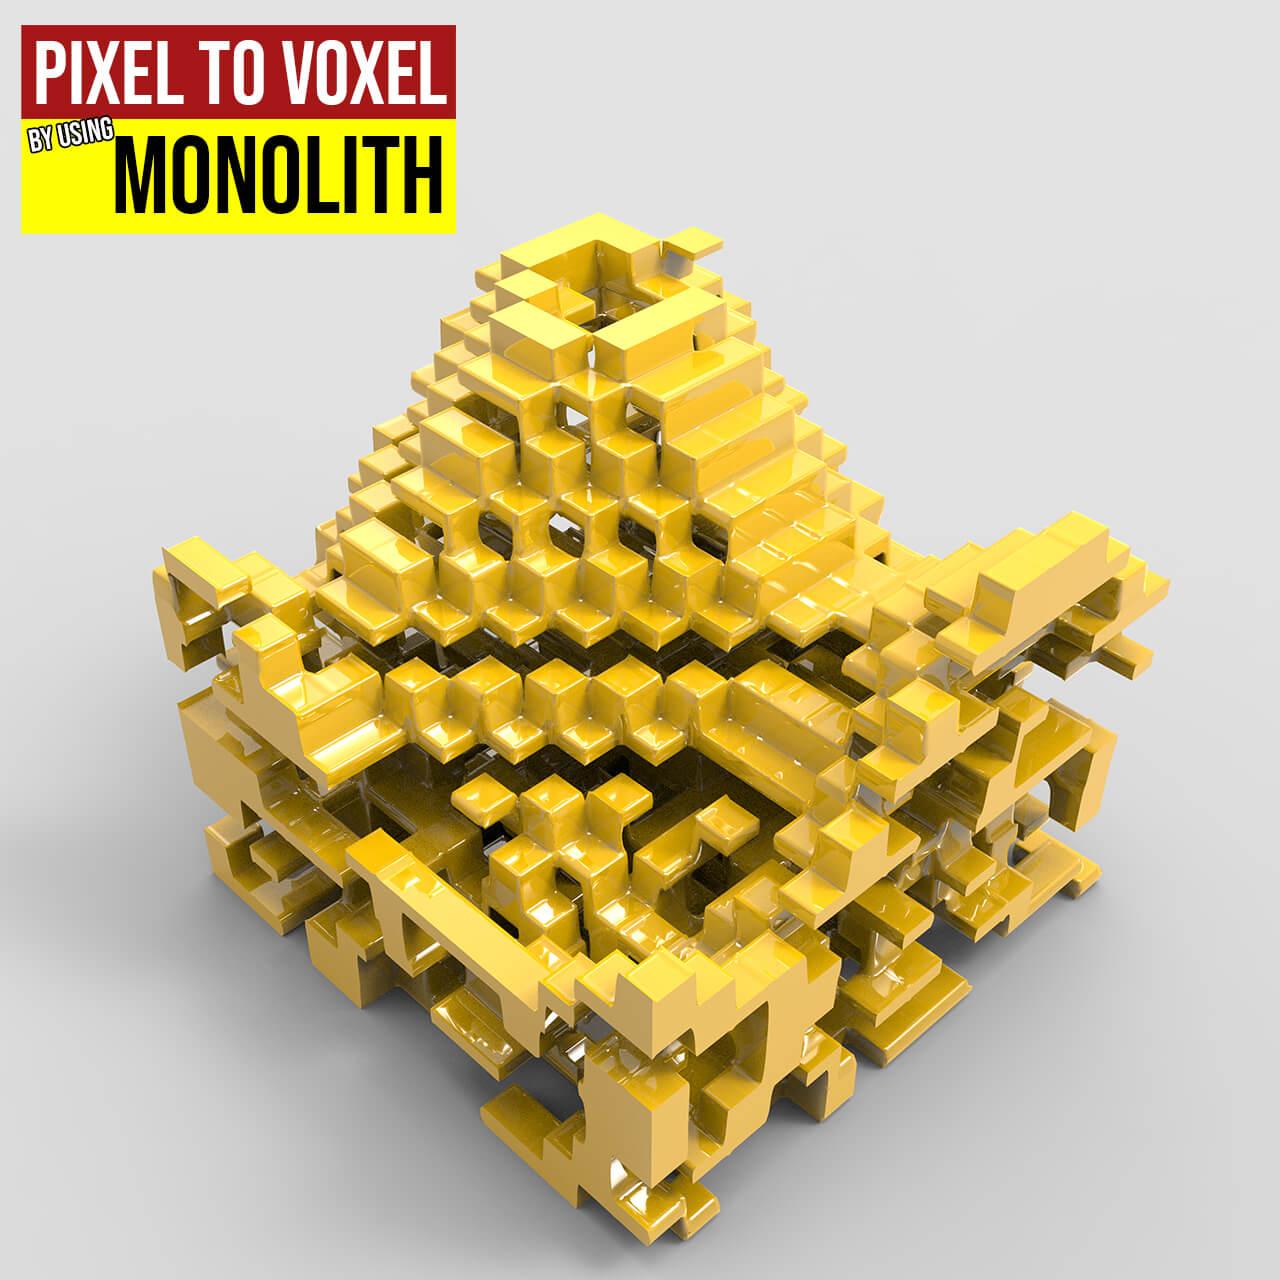 pixel to voxel 1200